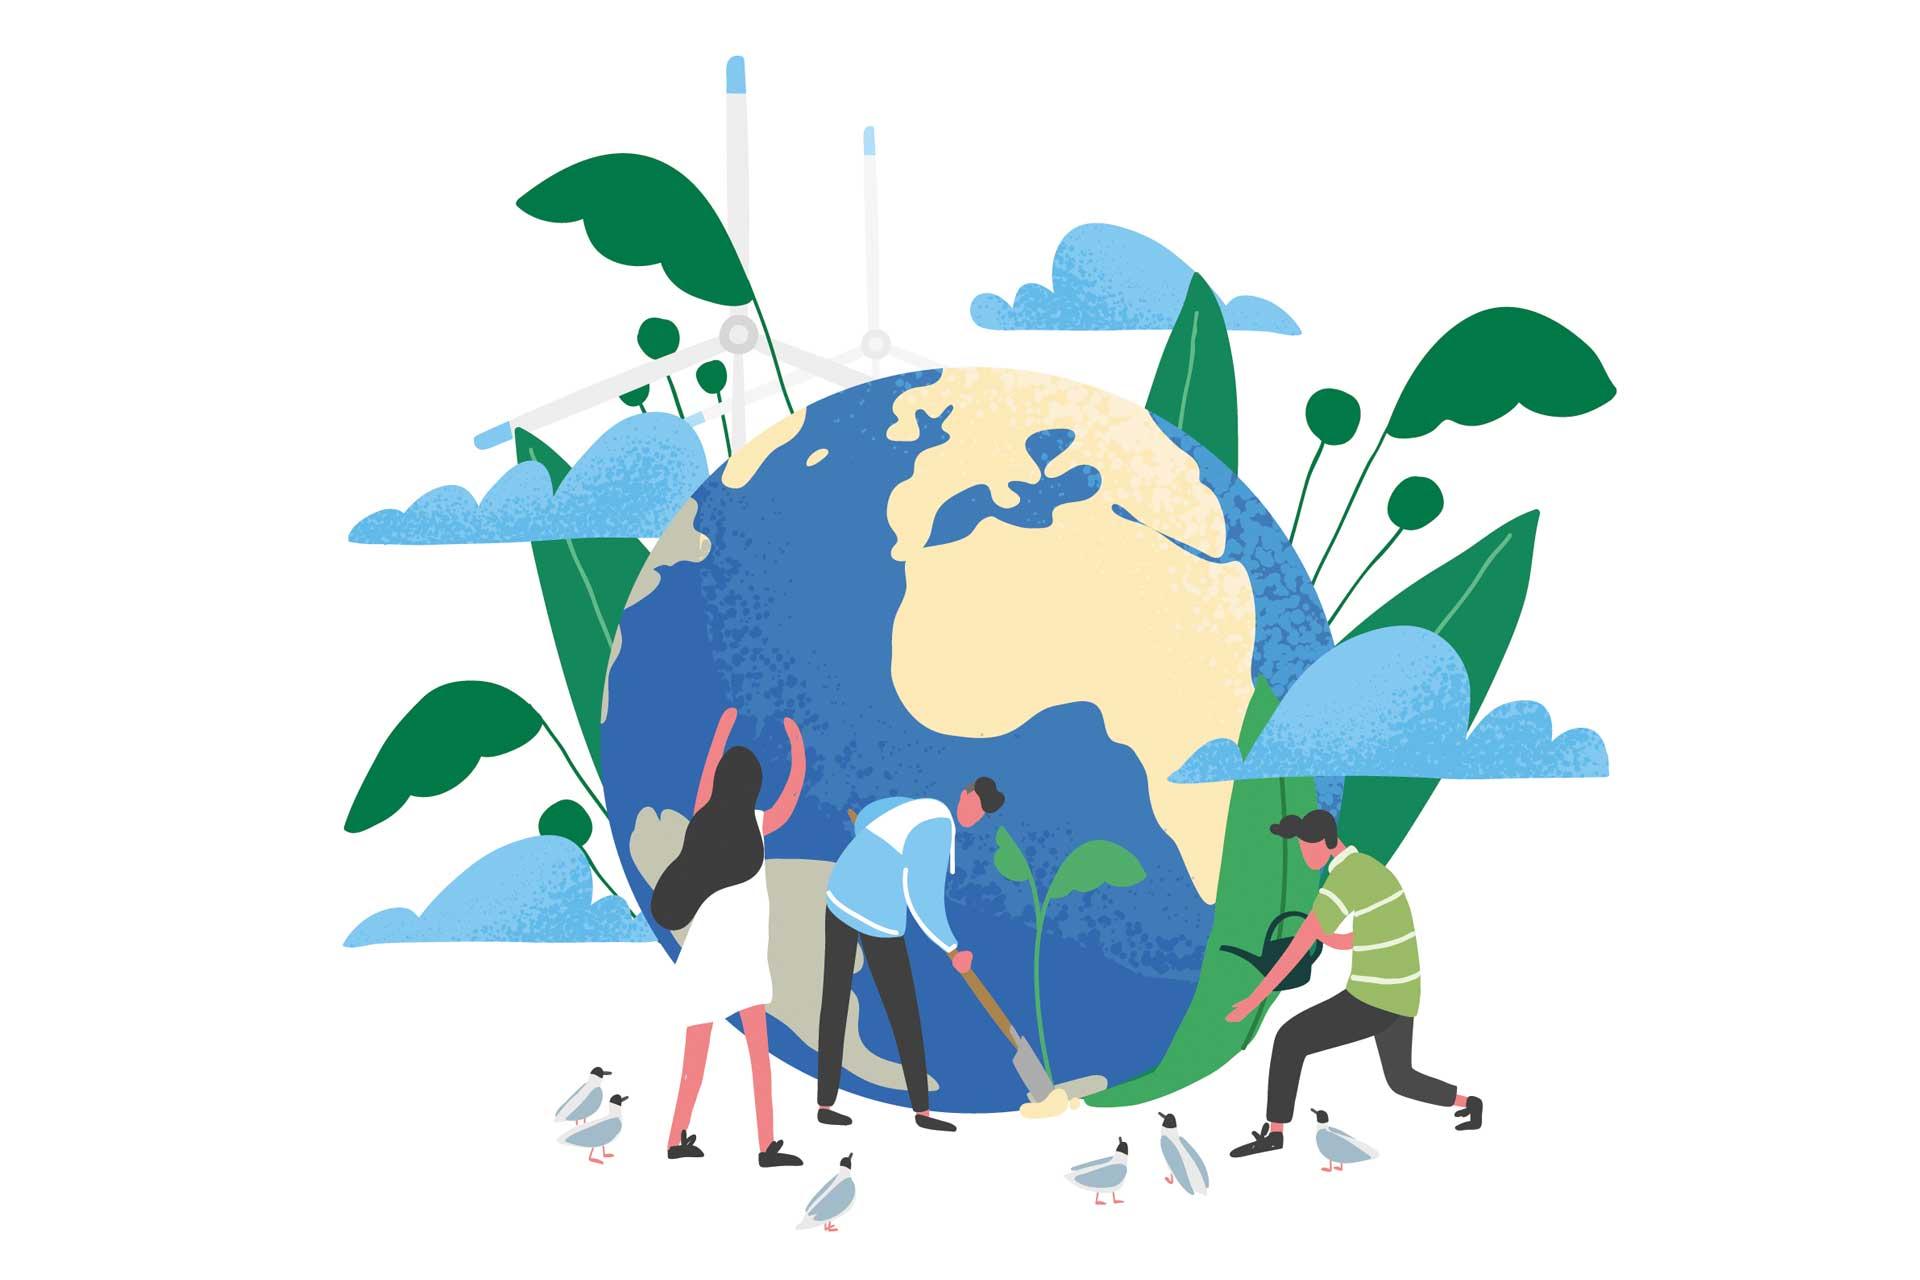 Earth Care Challenge Nr. 3: Produziere keinen Abfall